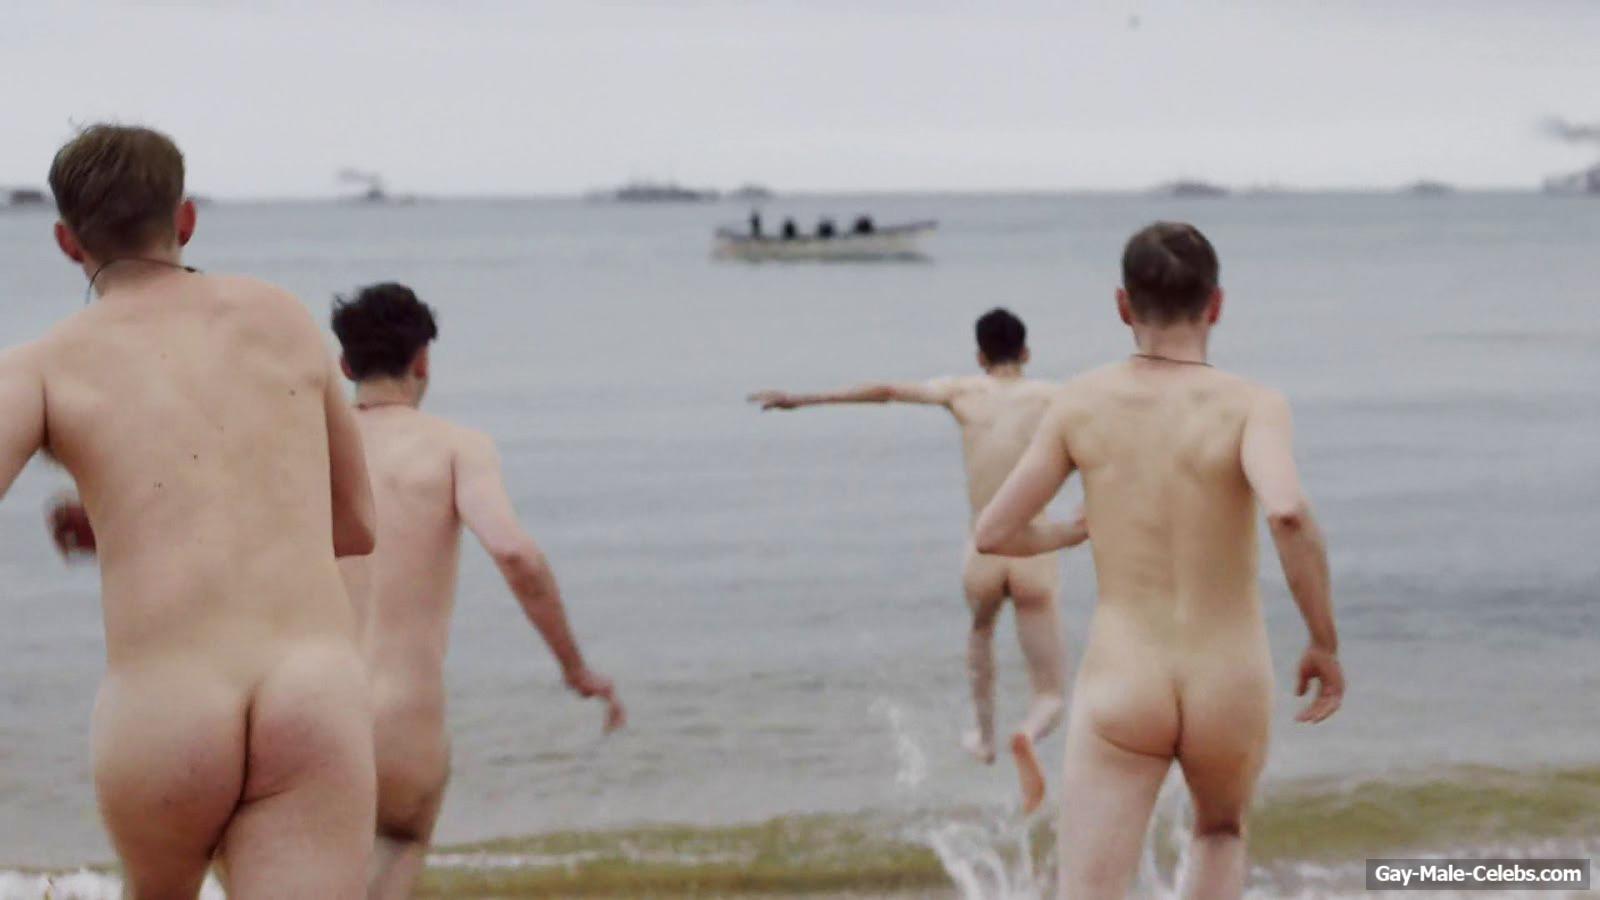 Kodi Smit-McPhee Nude And Sexy Pics & Vids